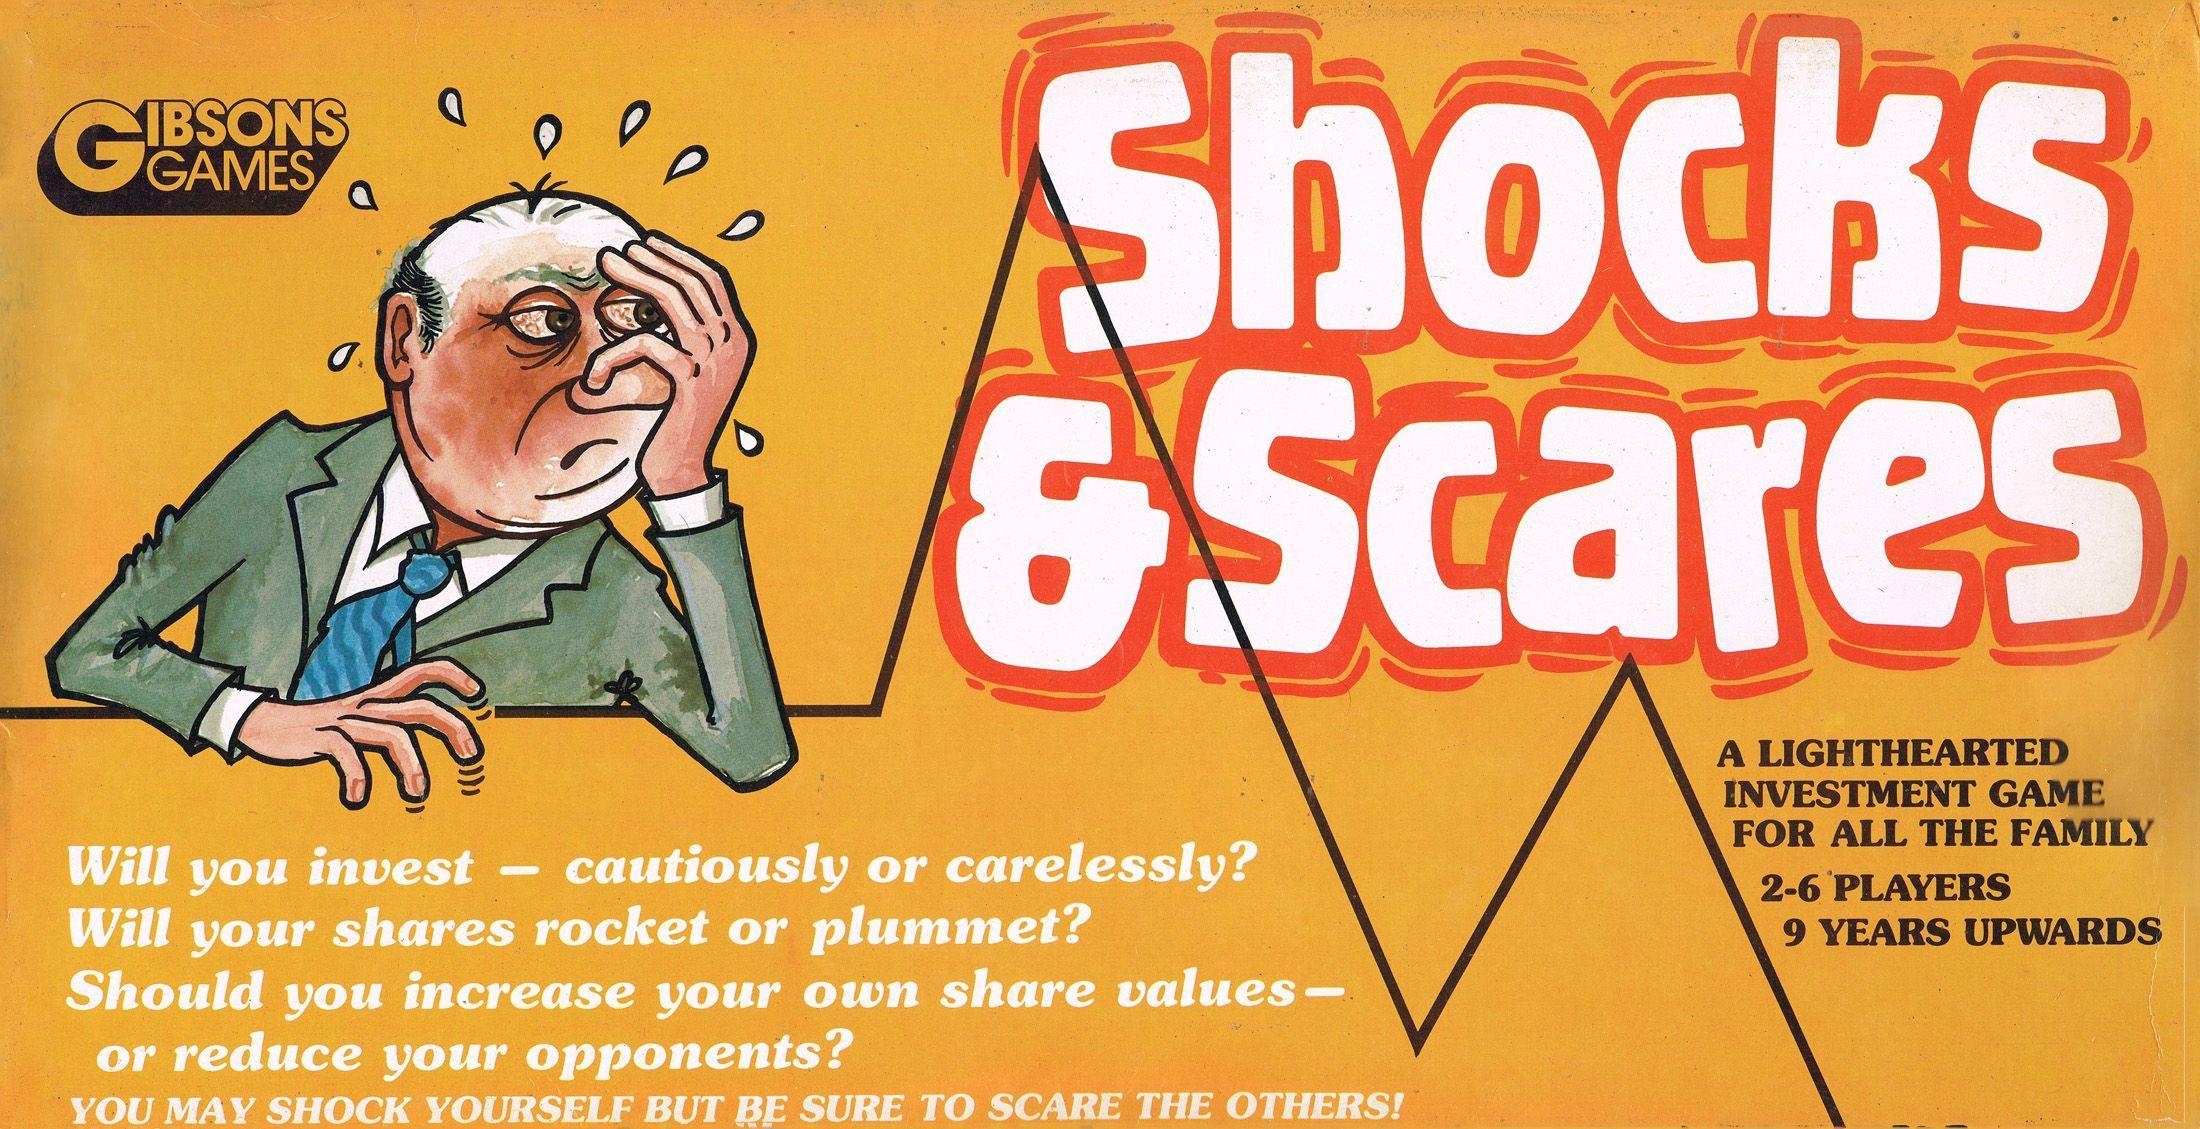 Shocks & Scares